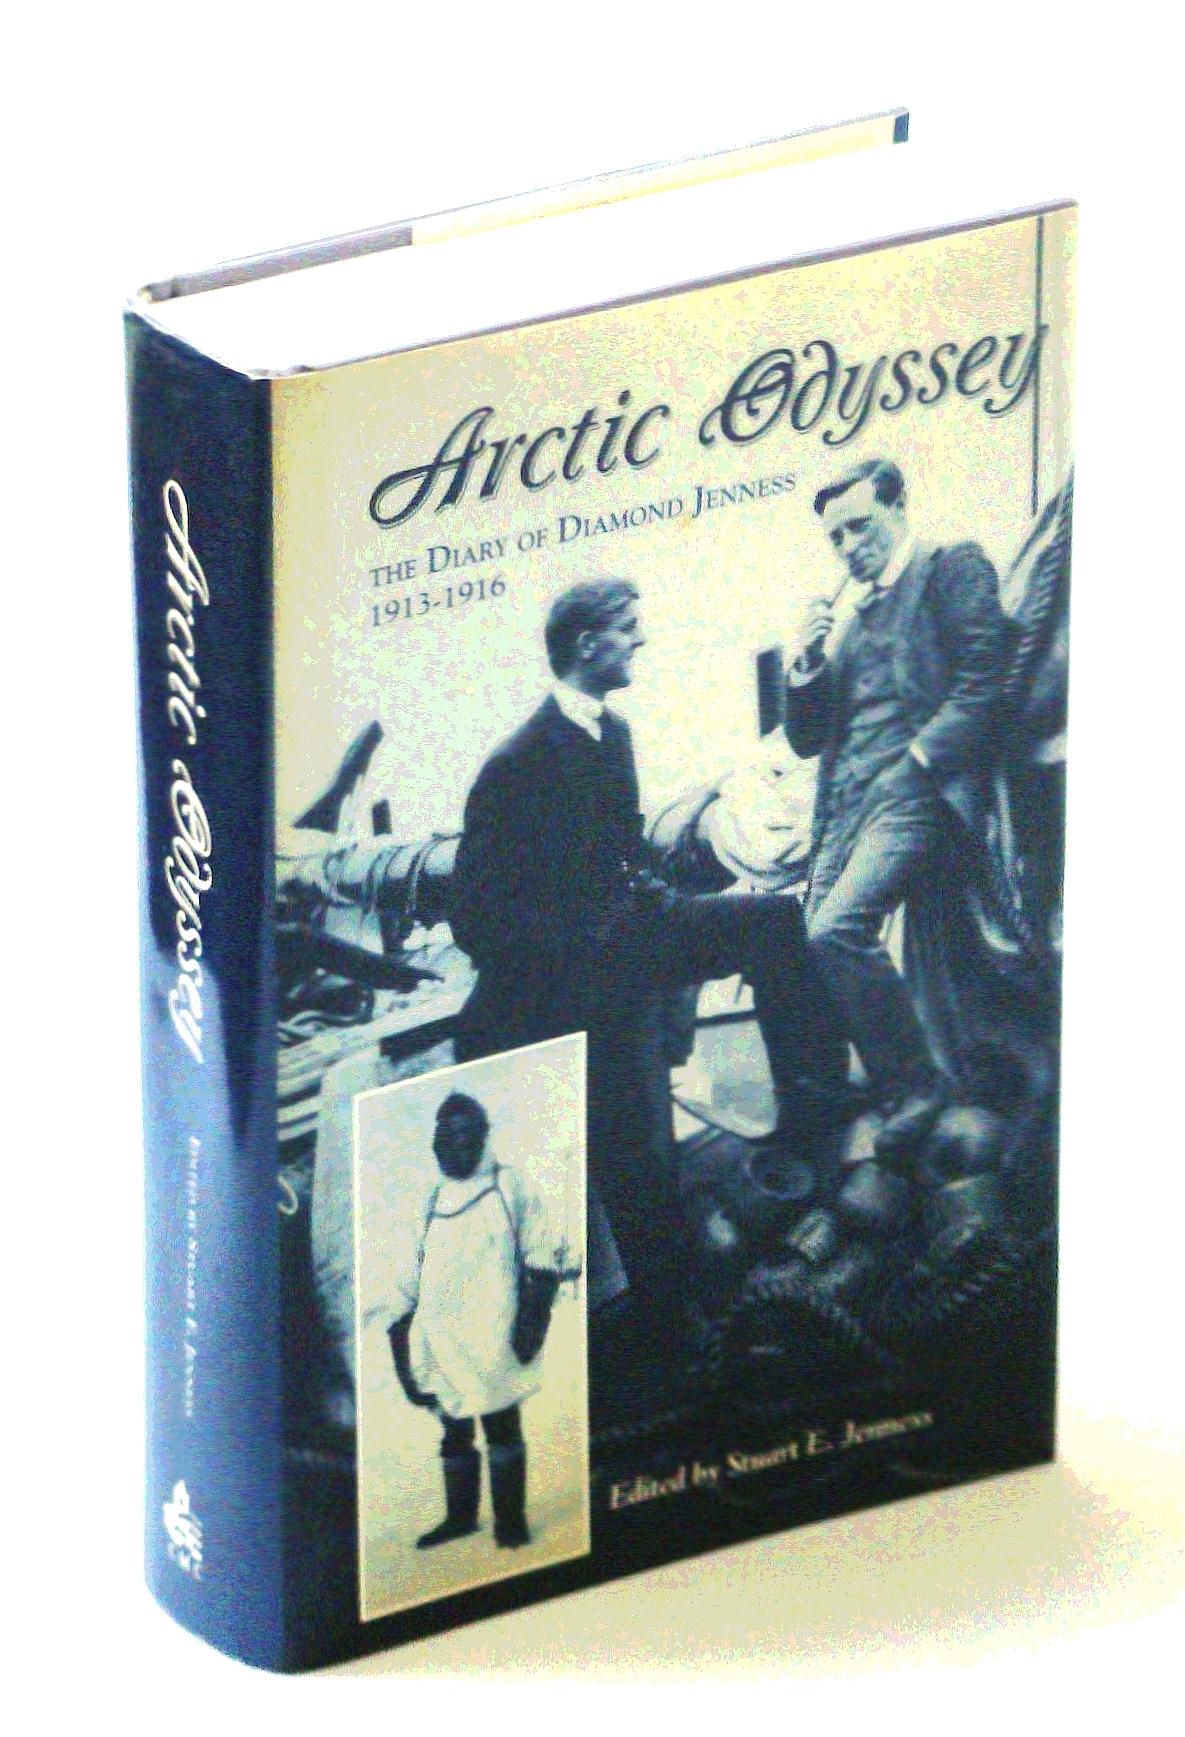 Arctic Odyssey: The Diary of Diamond Jenness, 1913-1916